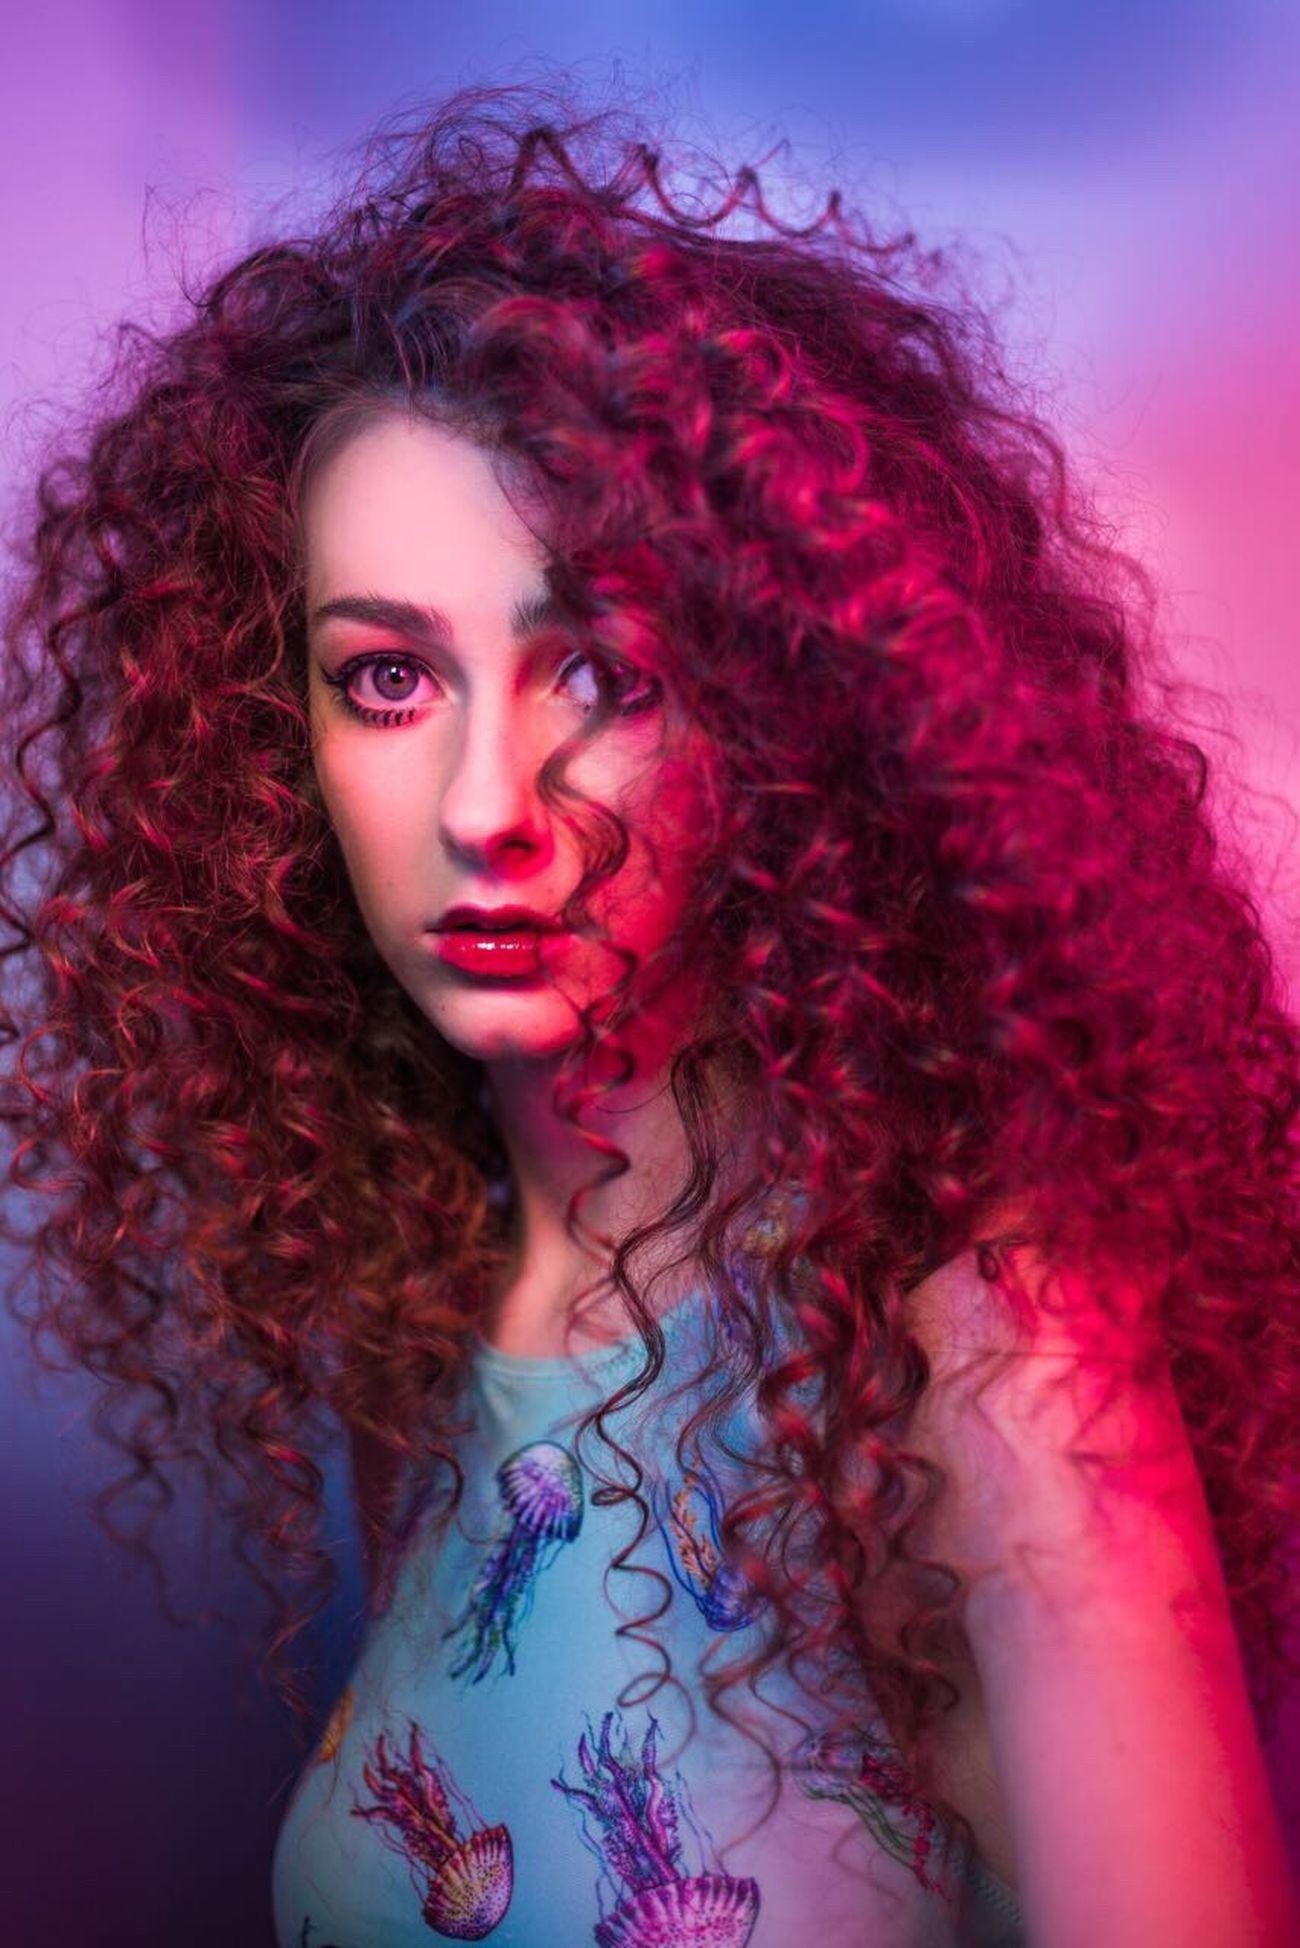 Model Fashion Neon Beauty Odetograce Colors Colourpop This Week On Eyeem TheWeekOnEyeEM